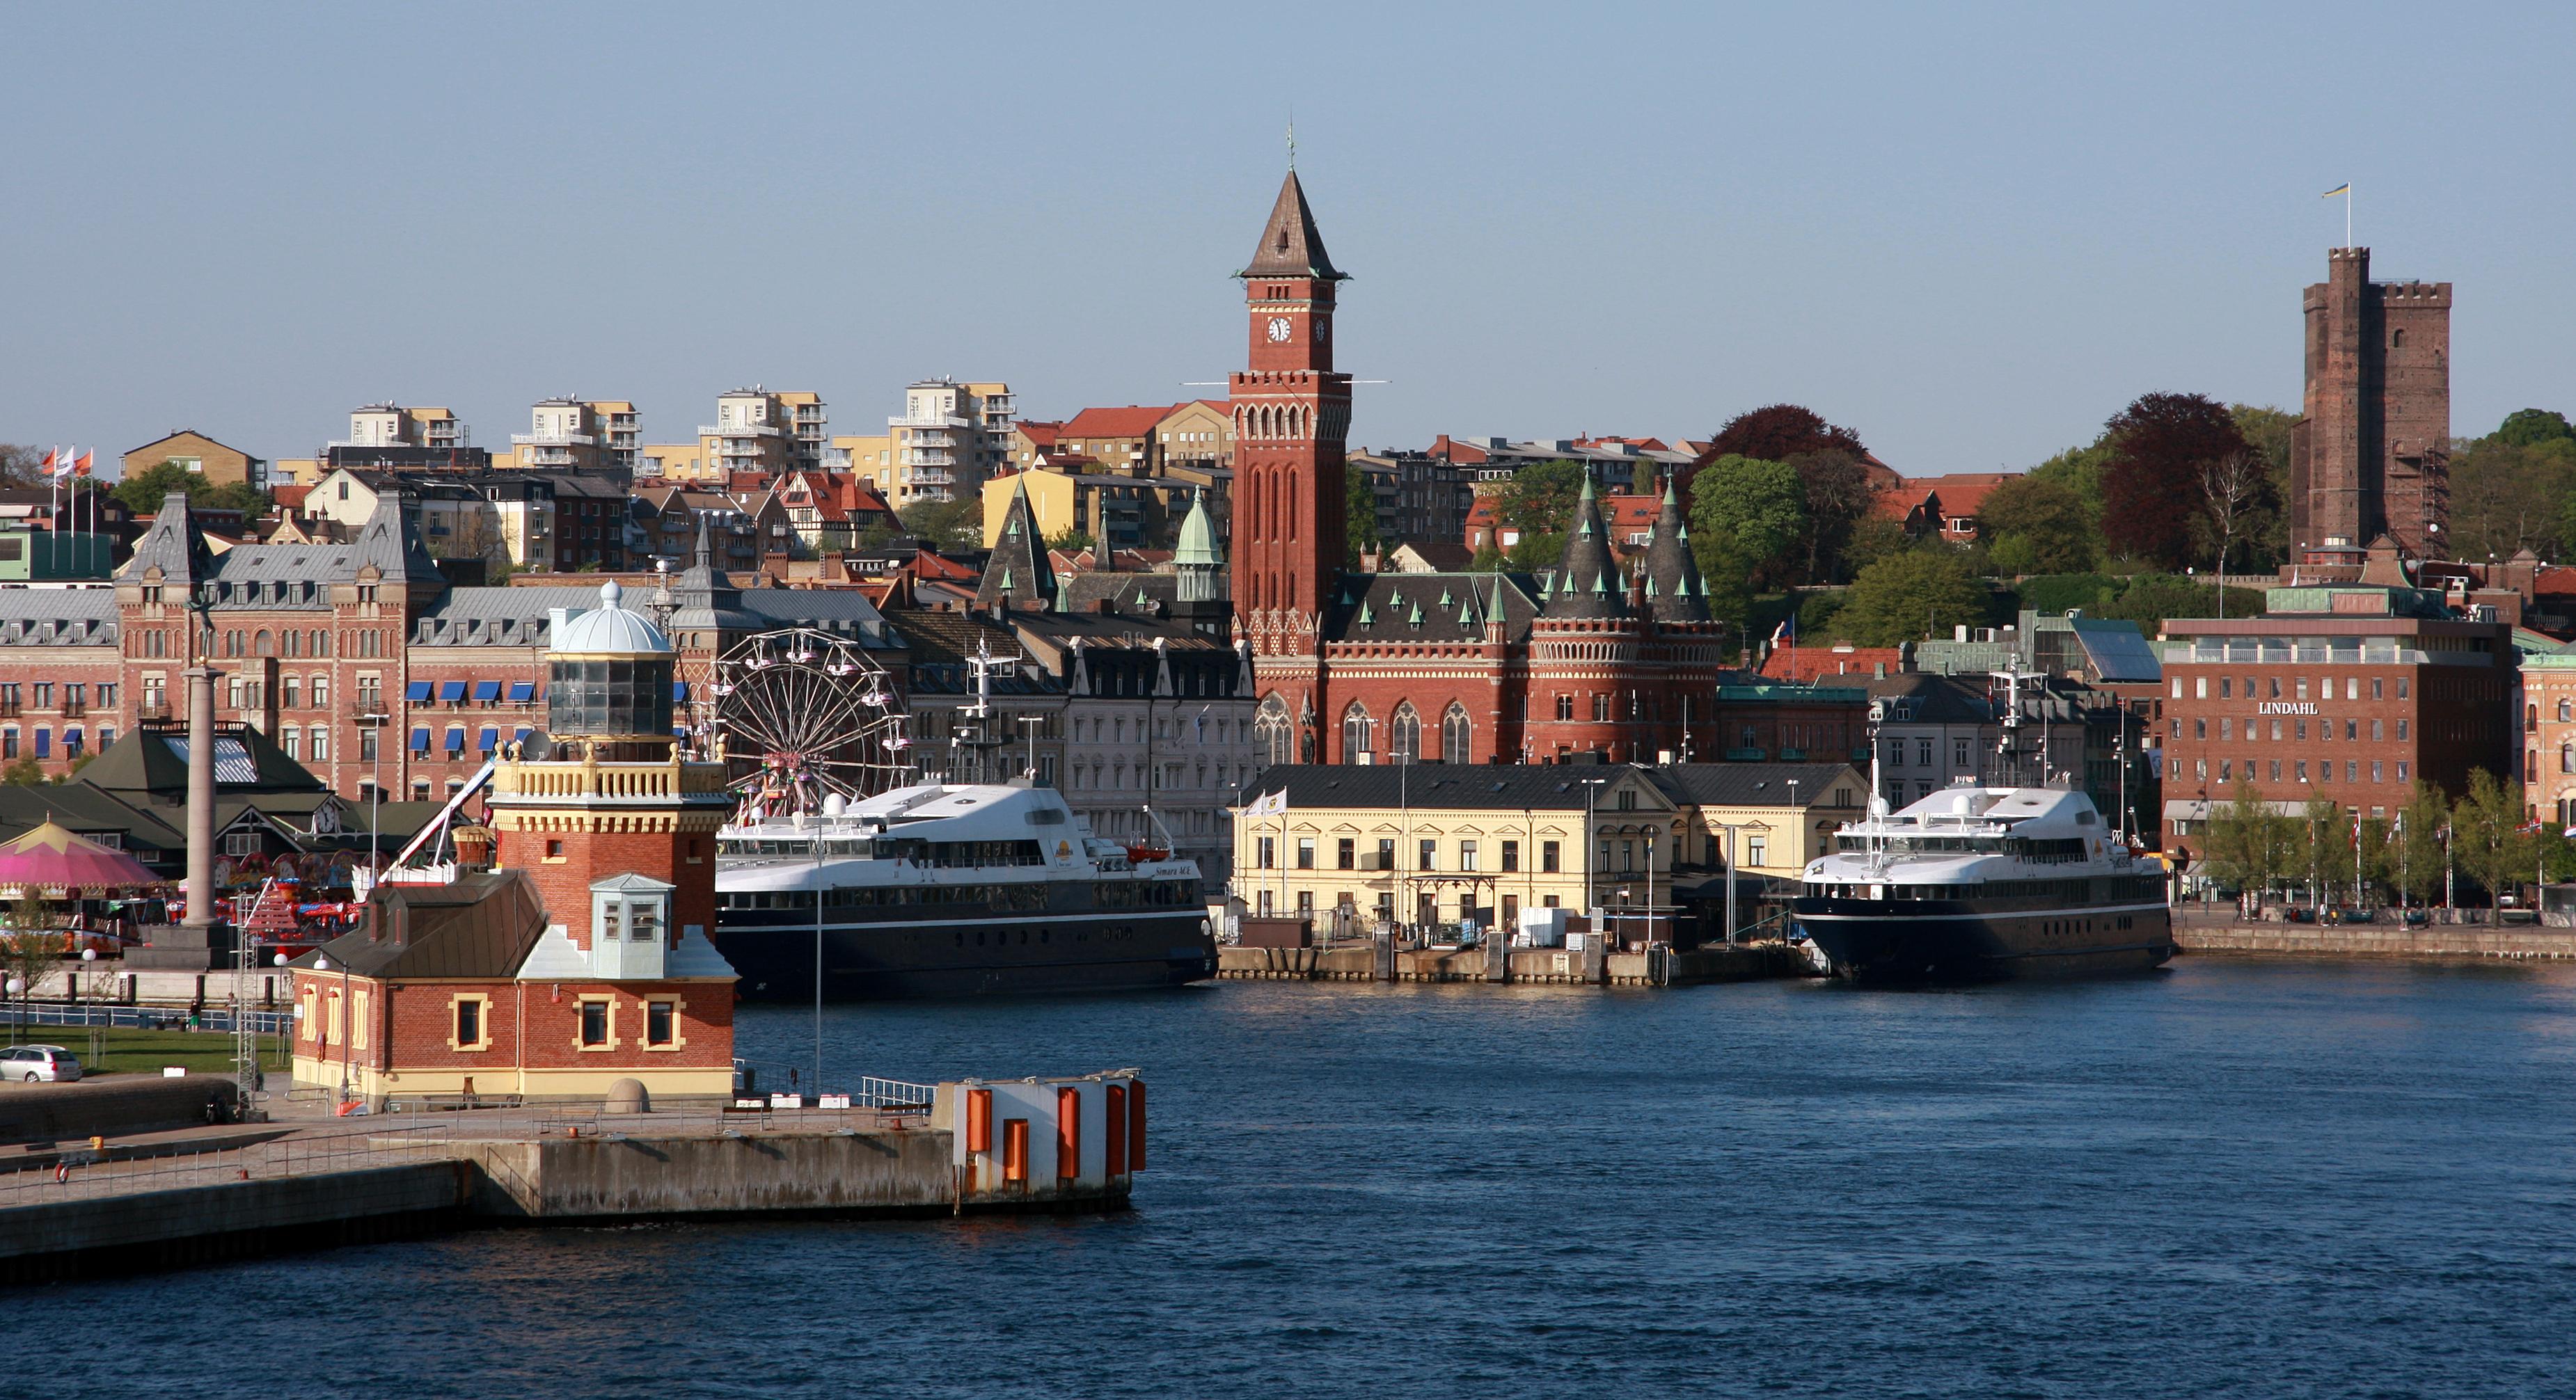 Helsingborg Sweden  City pictures : Original file  3,701 × 2,012 pixels, file size: 5.83 MB, MIME ...